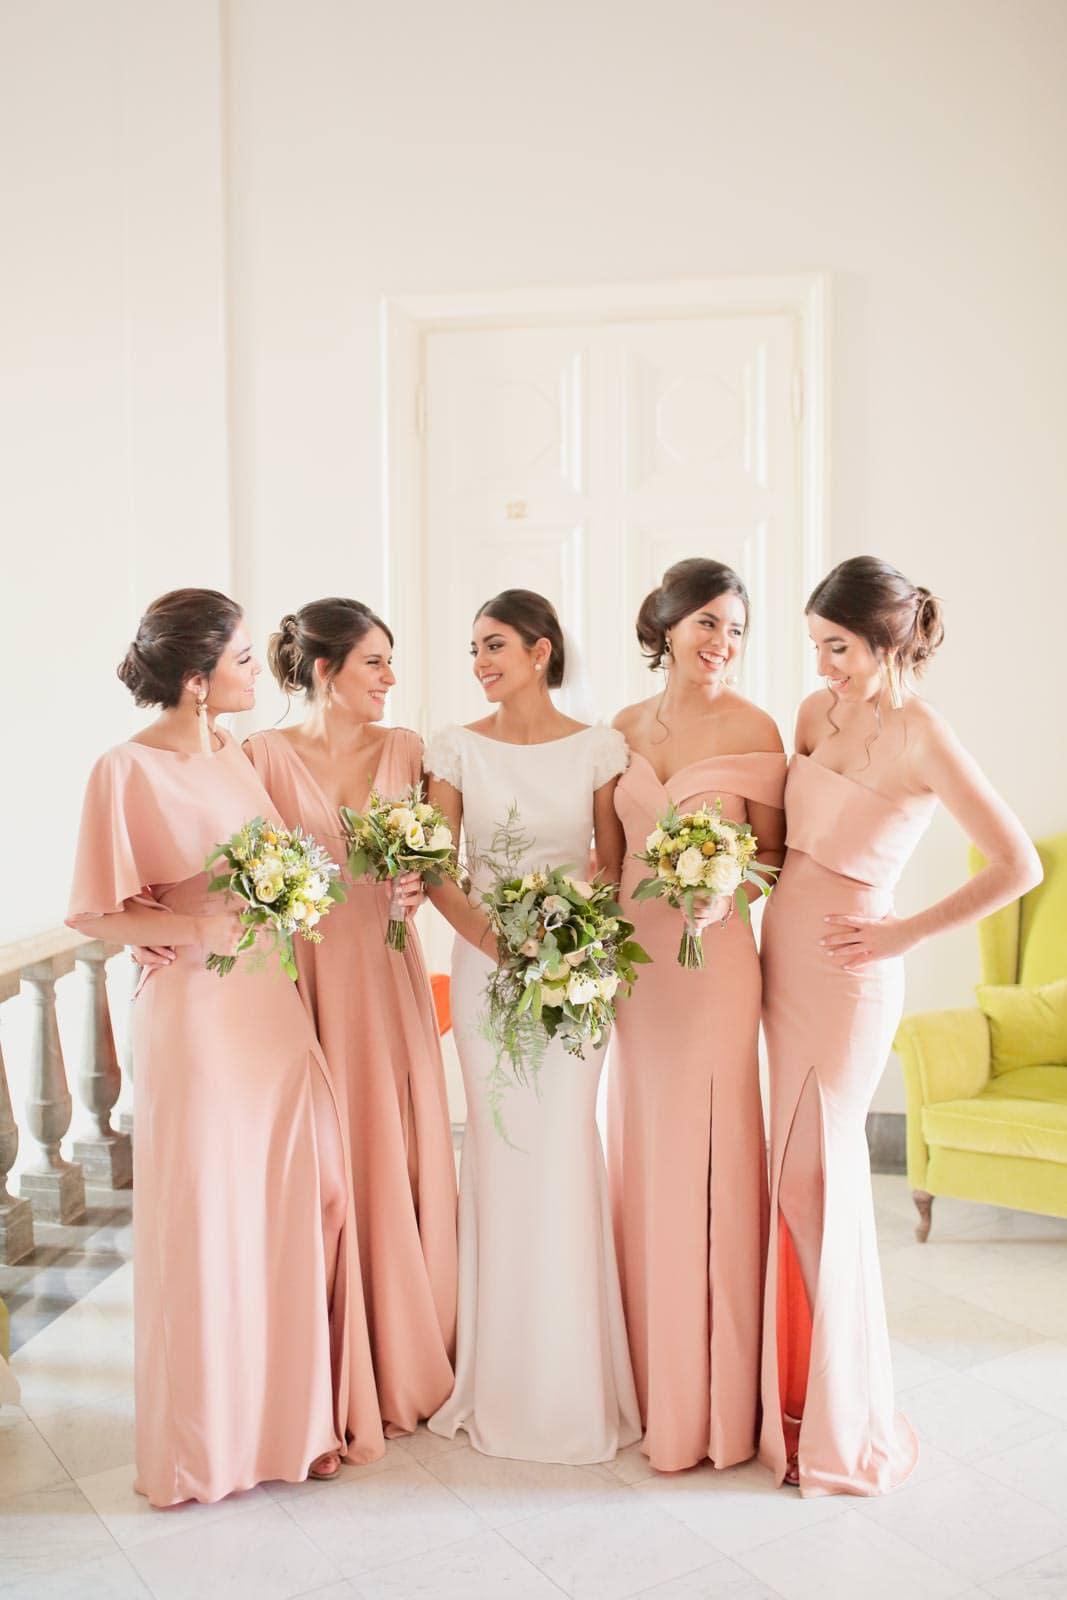 bride posing with the bridesmaids